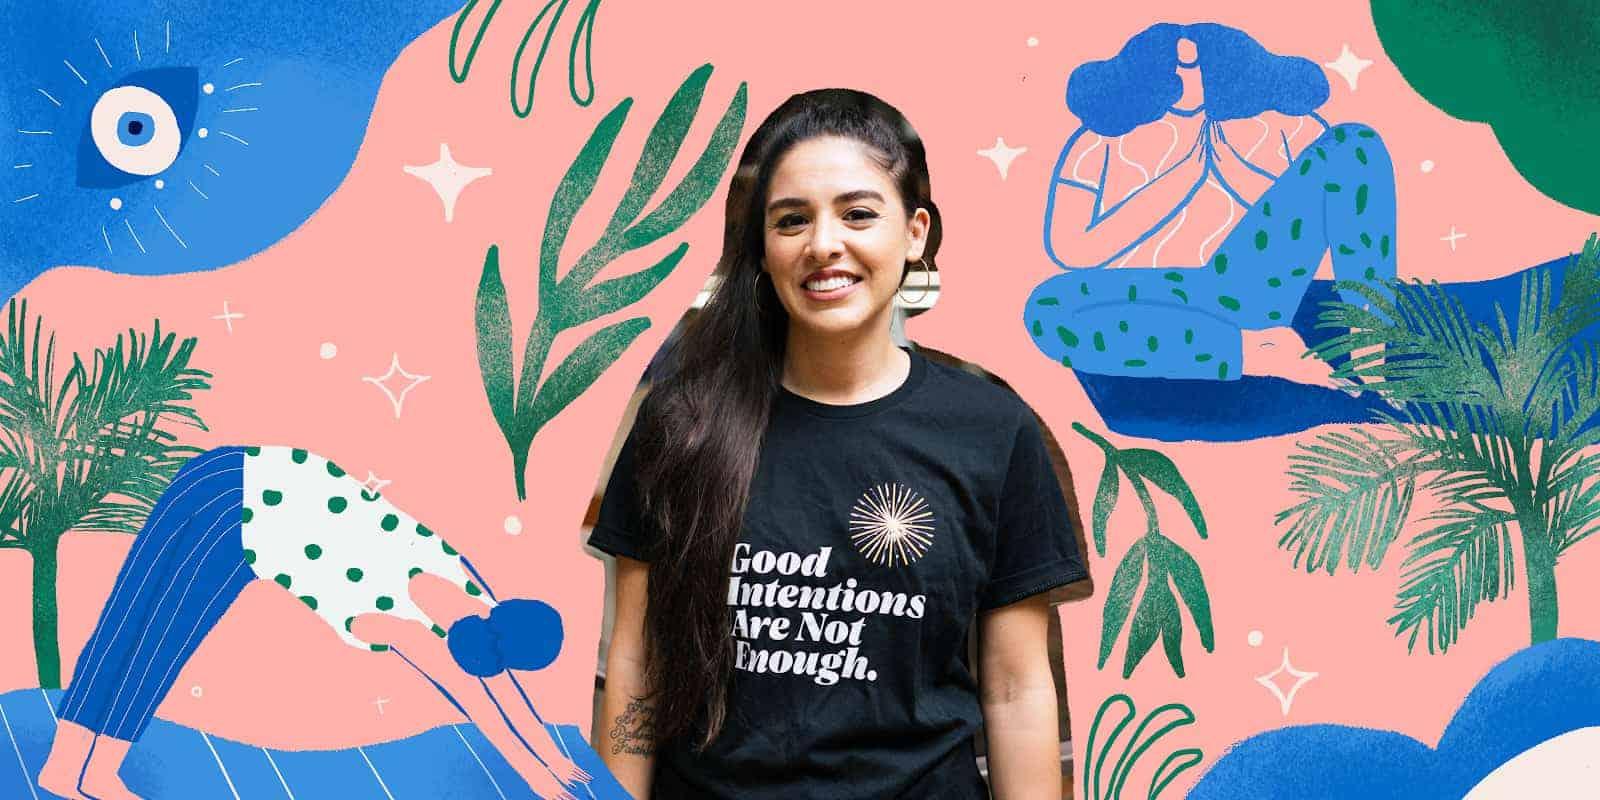 Women's History Month employee spotlight: Jessica Jimenez